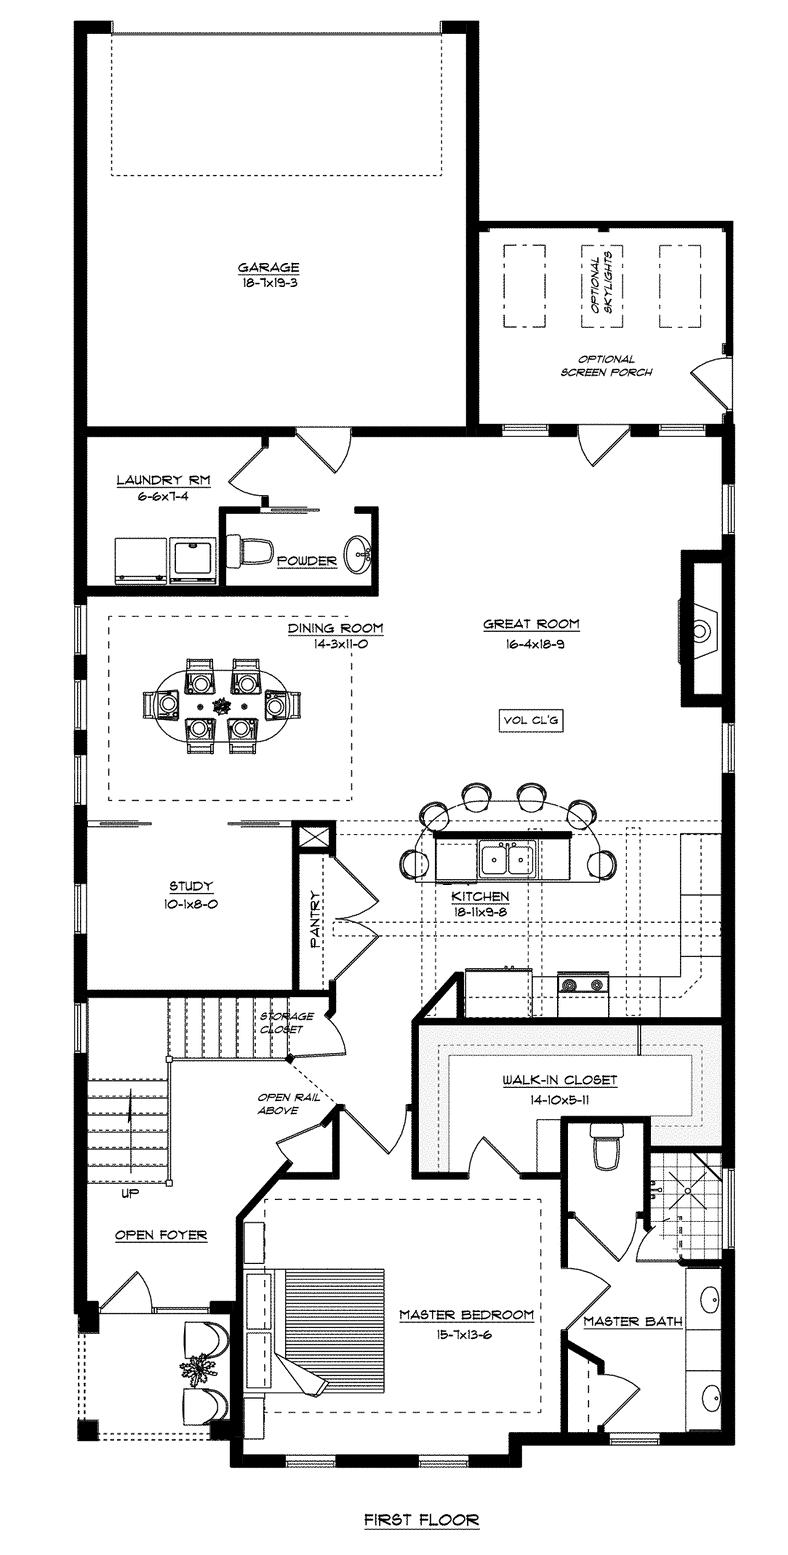 craig-builders-OT-Courtyard-Brookfield-FIRST-FLOOR